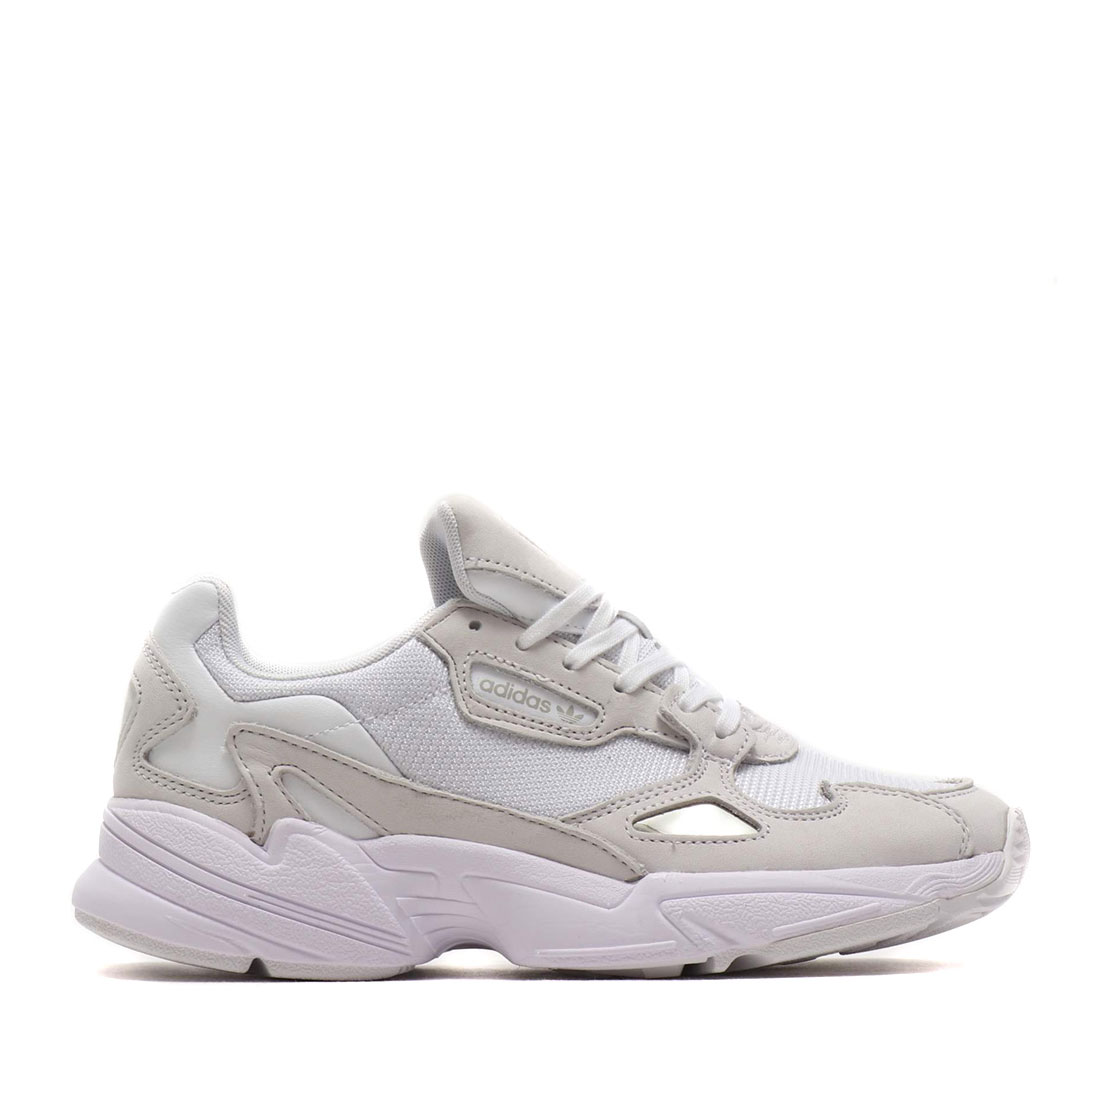 e48902cebf24 Kinetics  adidas Originals ADIDASFALCON W (RUNNING WHITE RUNNING WHITE CRYSTAL  WHITE) (Adidas originals falcon W)